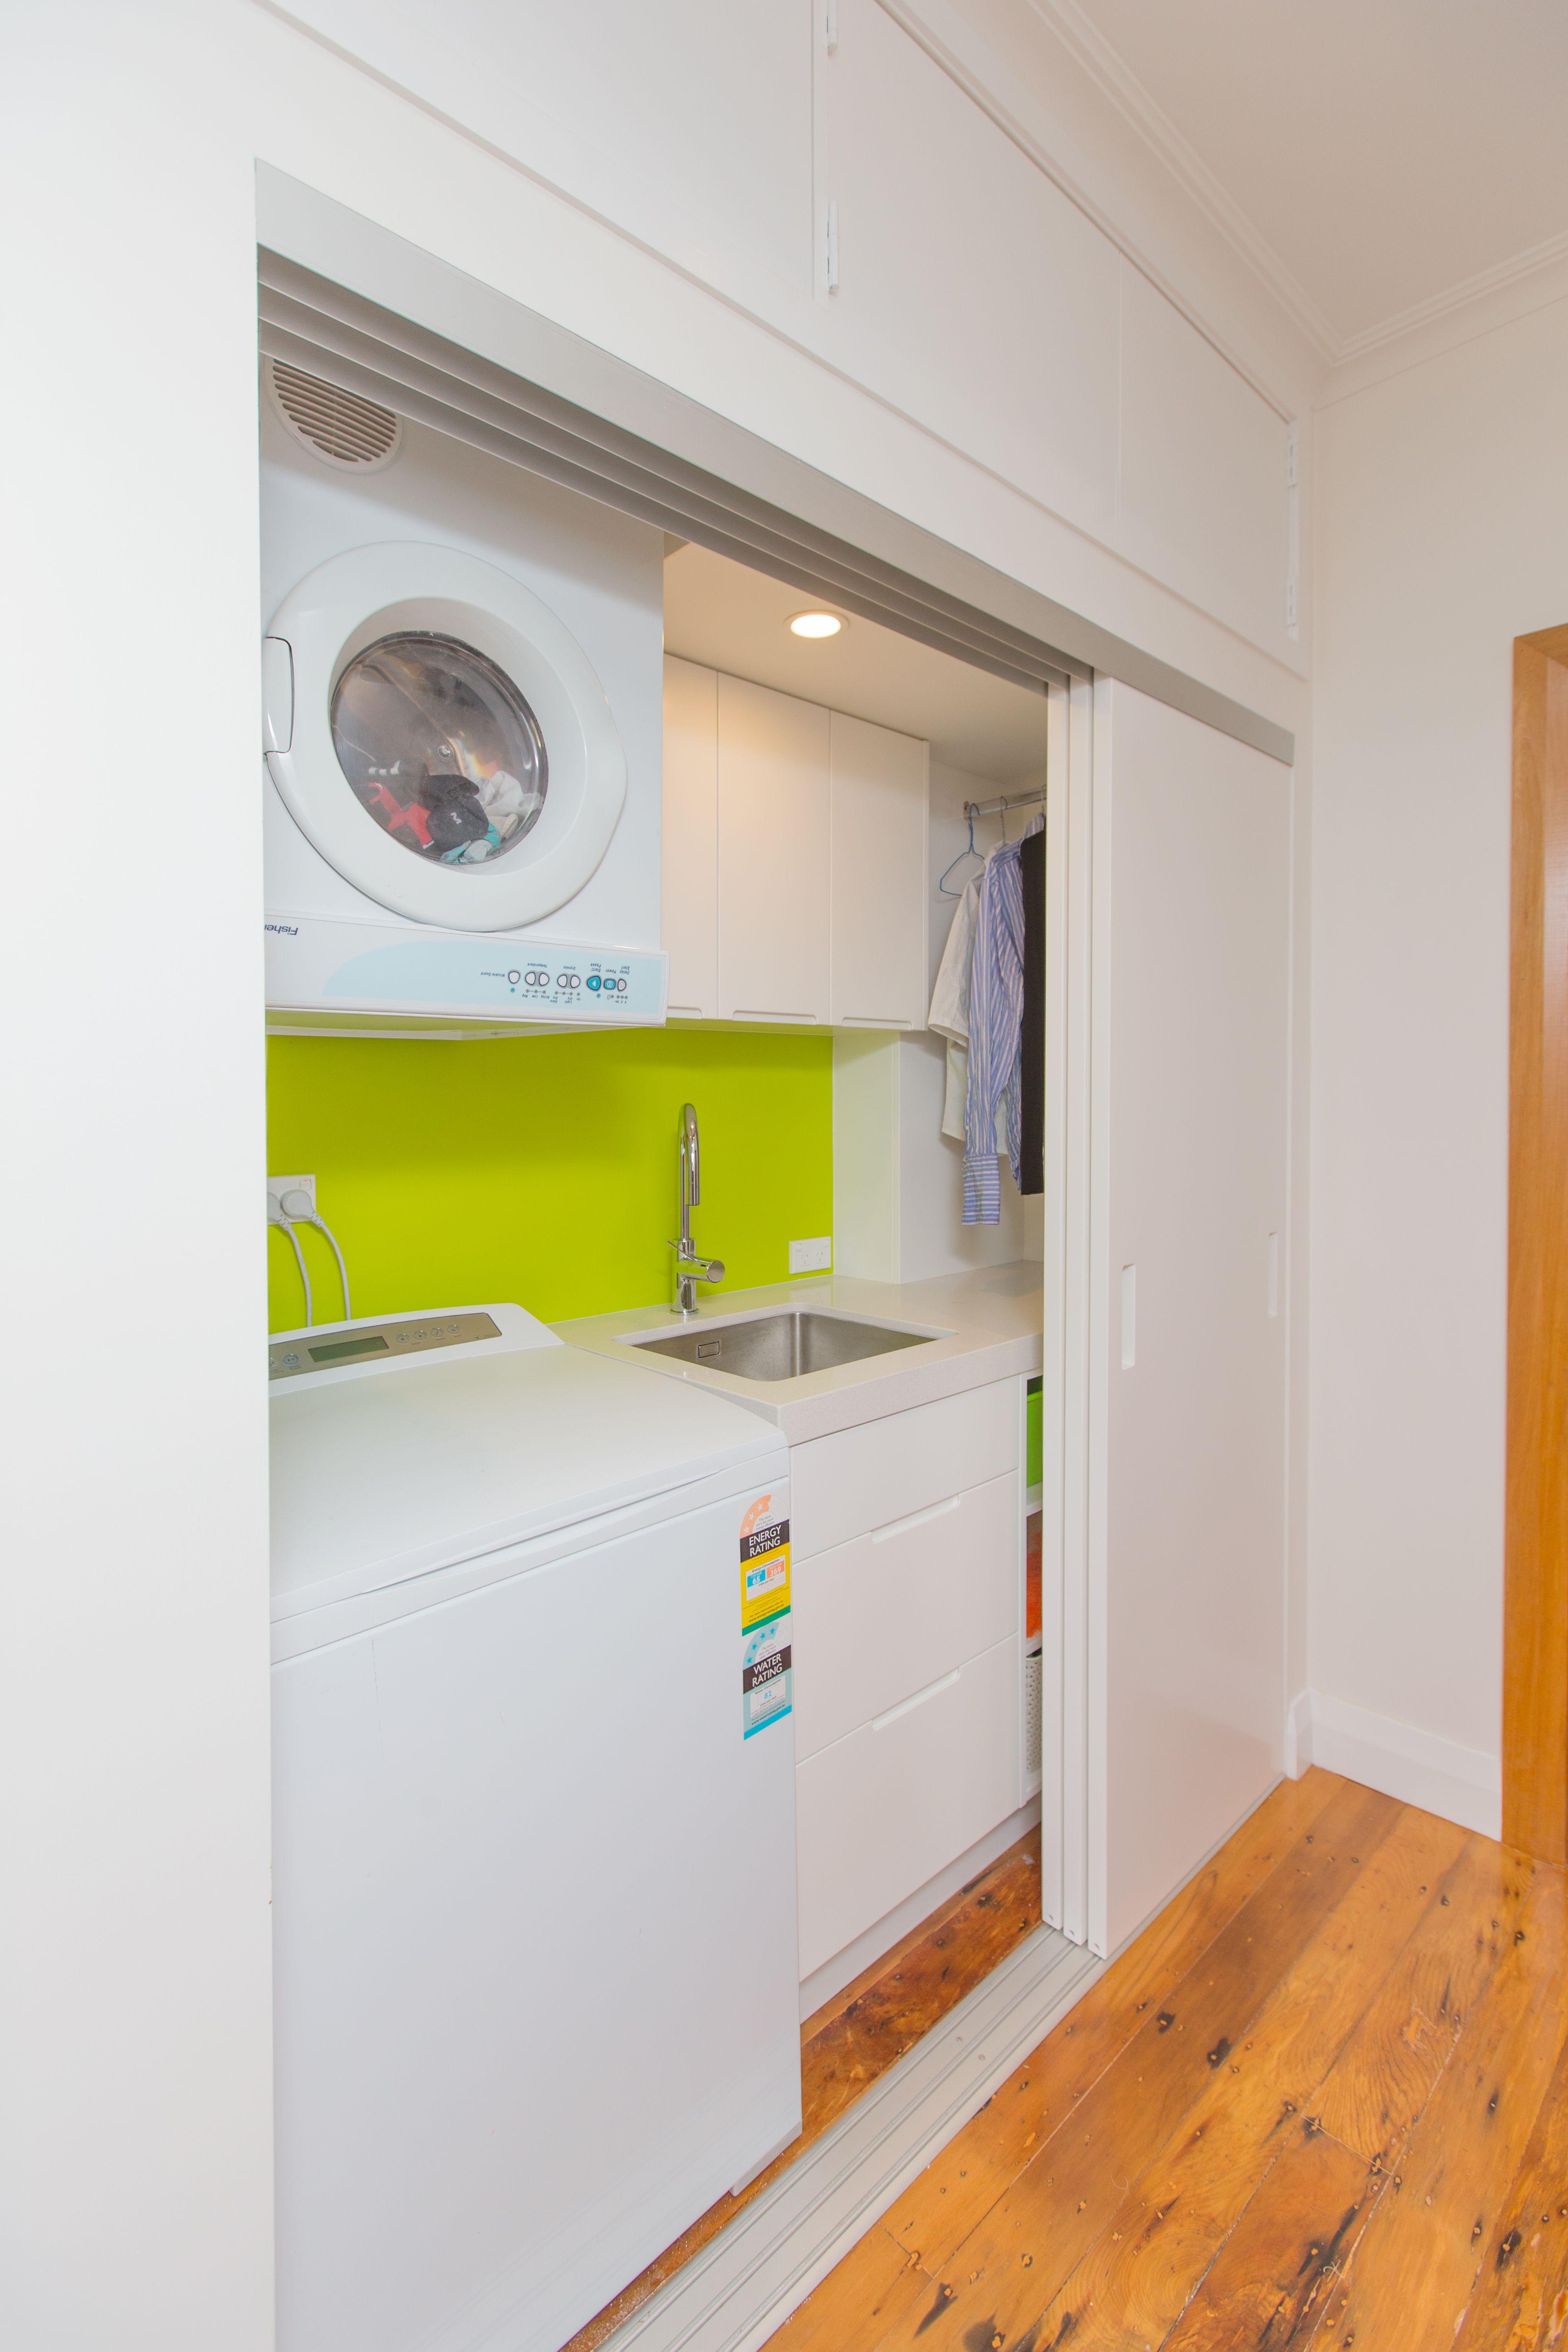 Pin By Piotr Rudz On Laundry Ideas Laundry Doors Kitchen